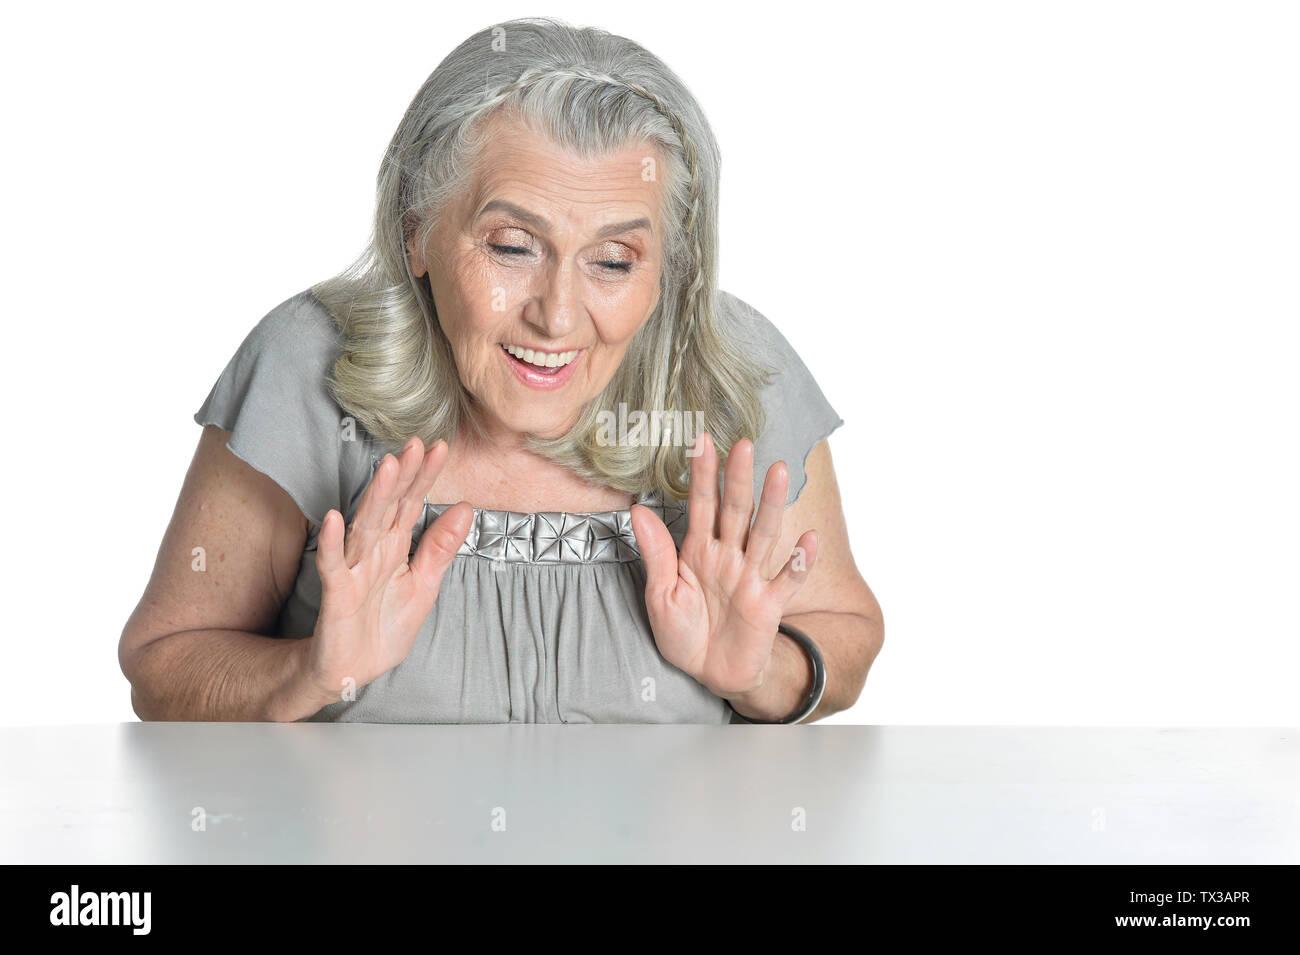 Emotional senior woman at table isolated on white background - Stock Image